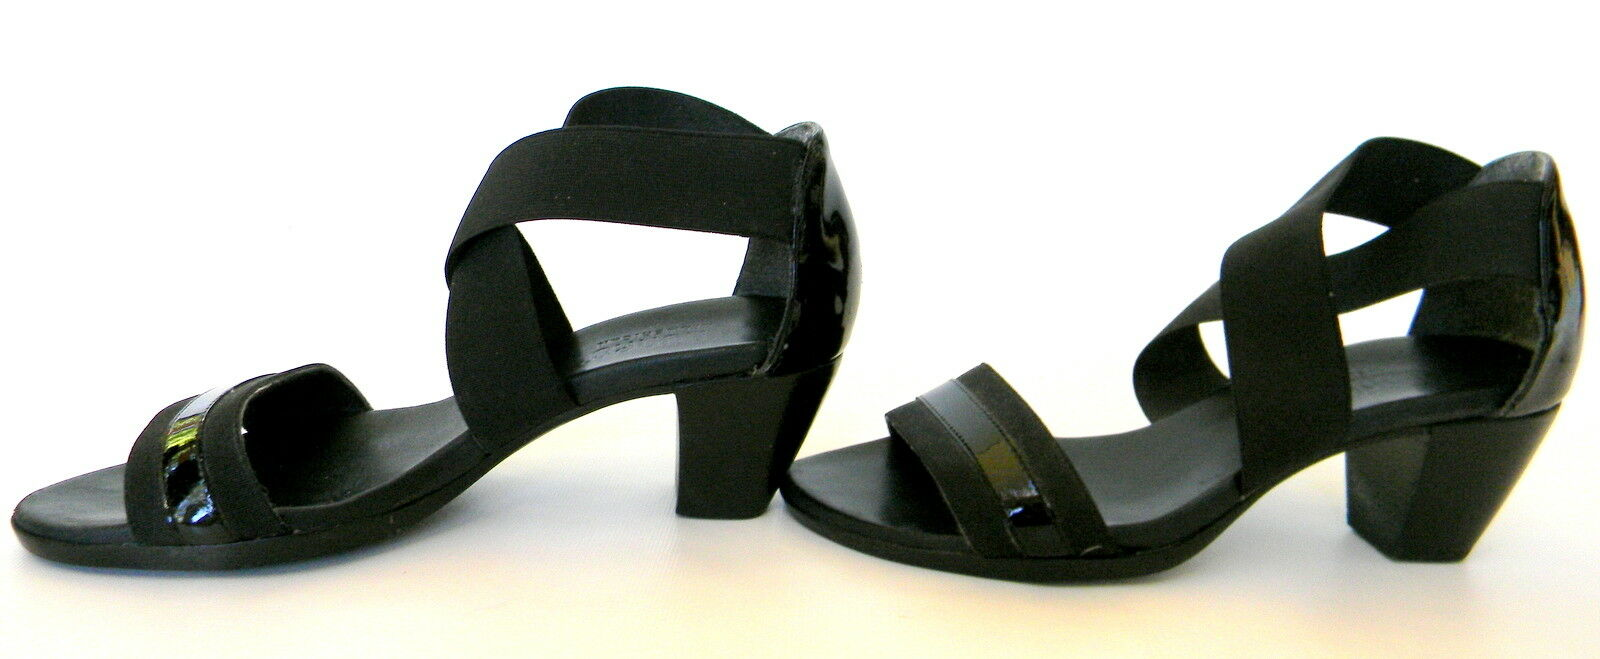 Munro Delana Womens Black Strappy Sandal Size 6m